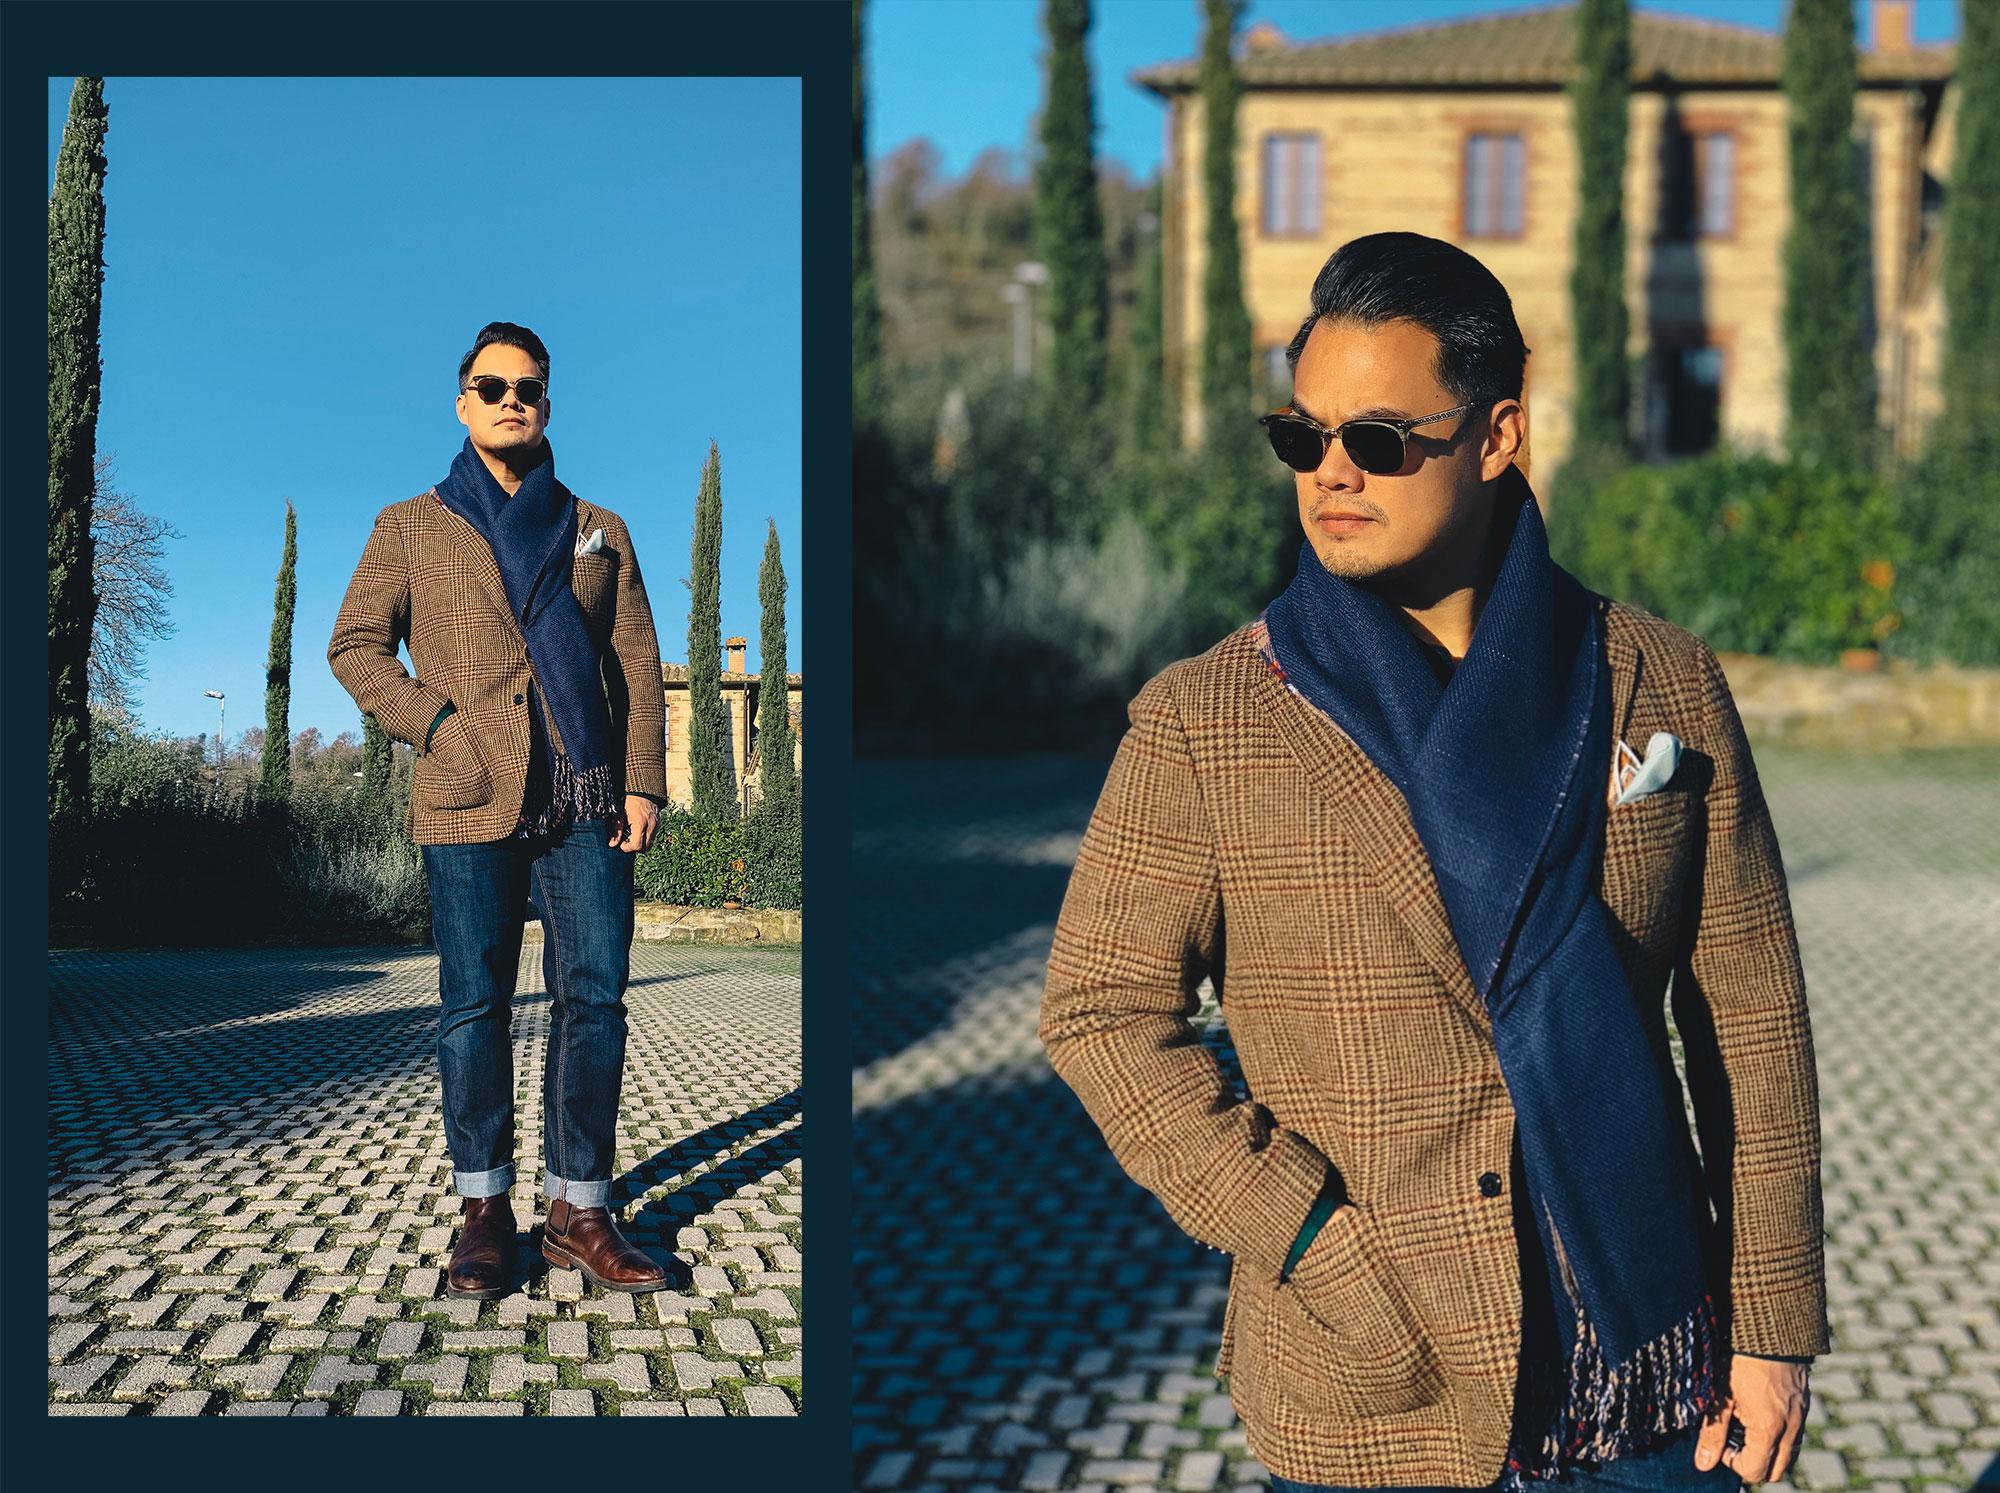 Spier & Mackay brown and red guncheck abraham moon tweed sport coat